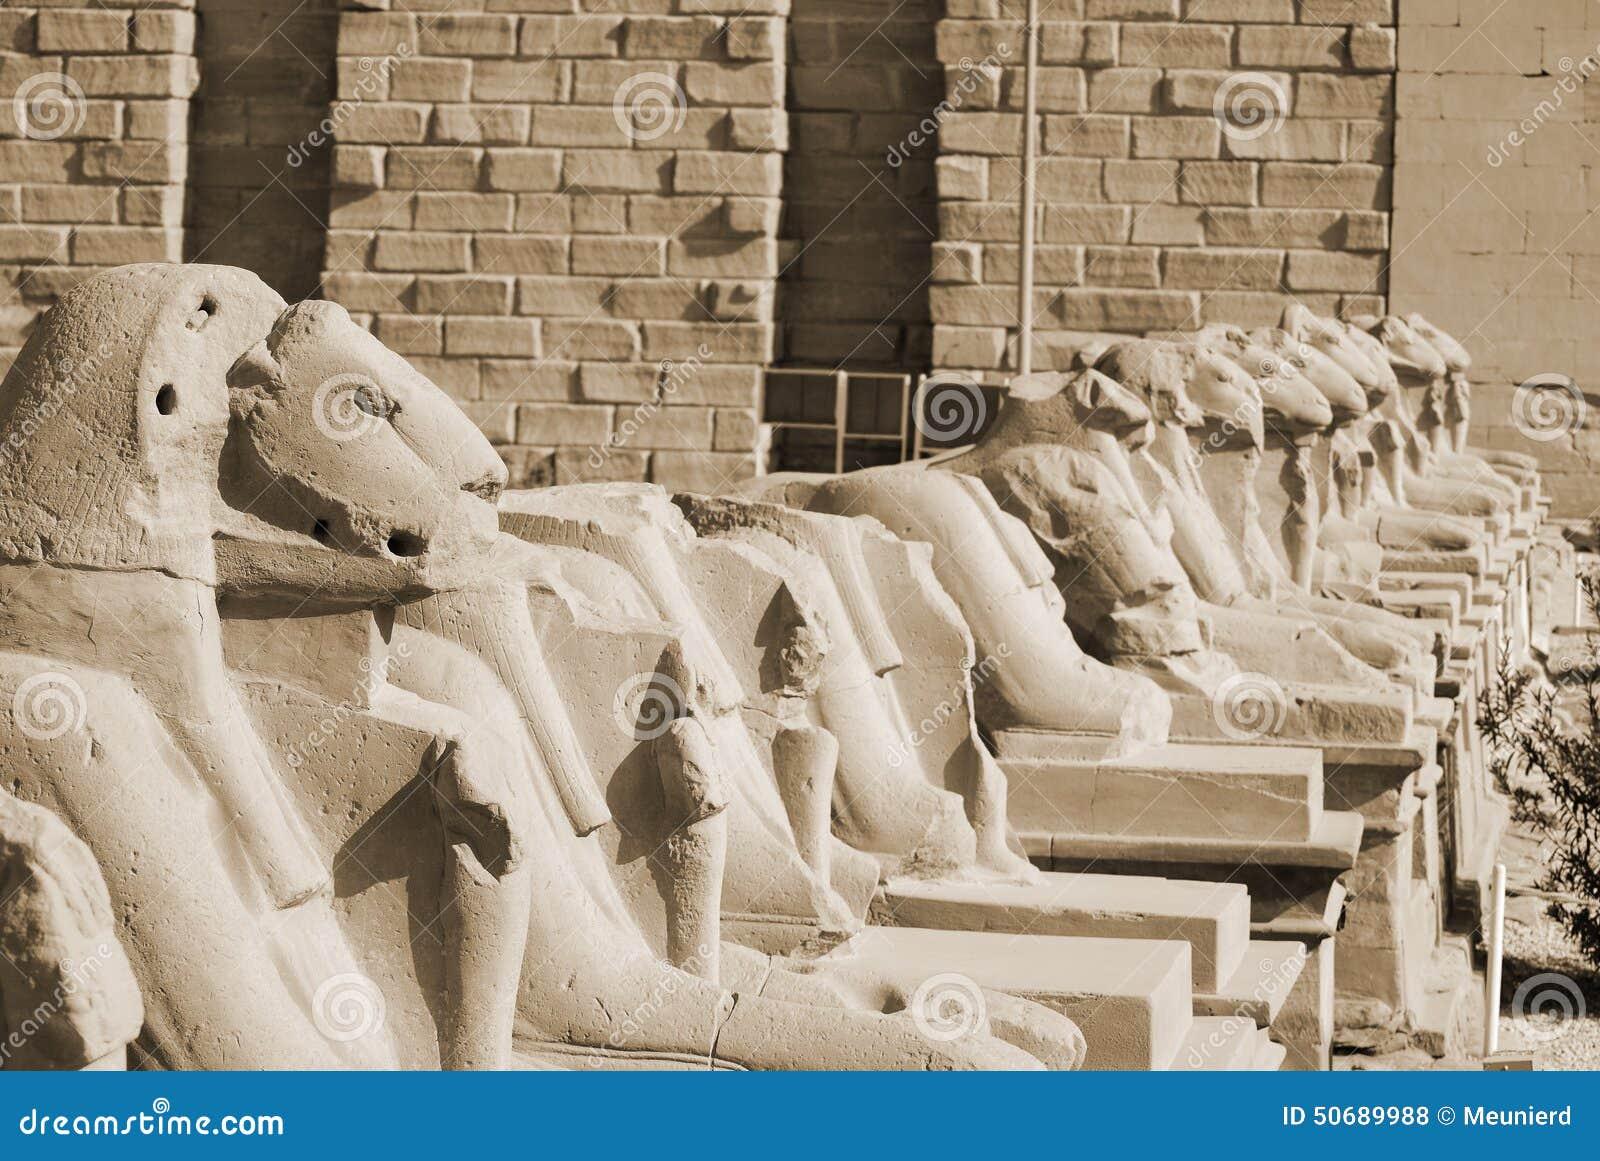 Download 与公羊头的胡同摇摆 库存照片. 图片 包括有 胡同, 拱道, 埃及, 女神, 历史记录, 坟墓, 文化, 平均数 - 50689988